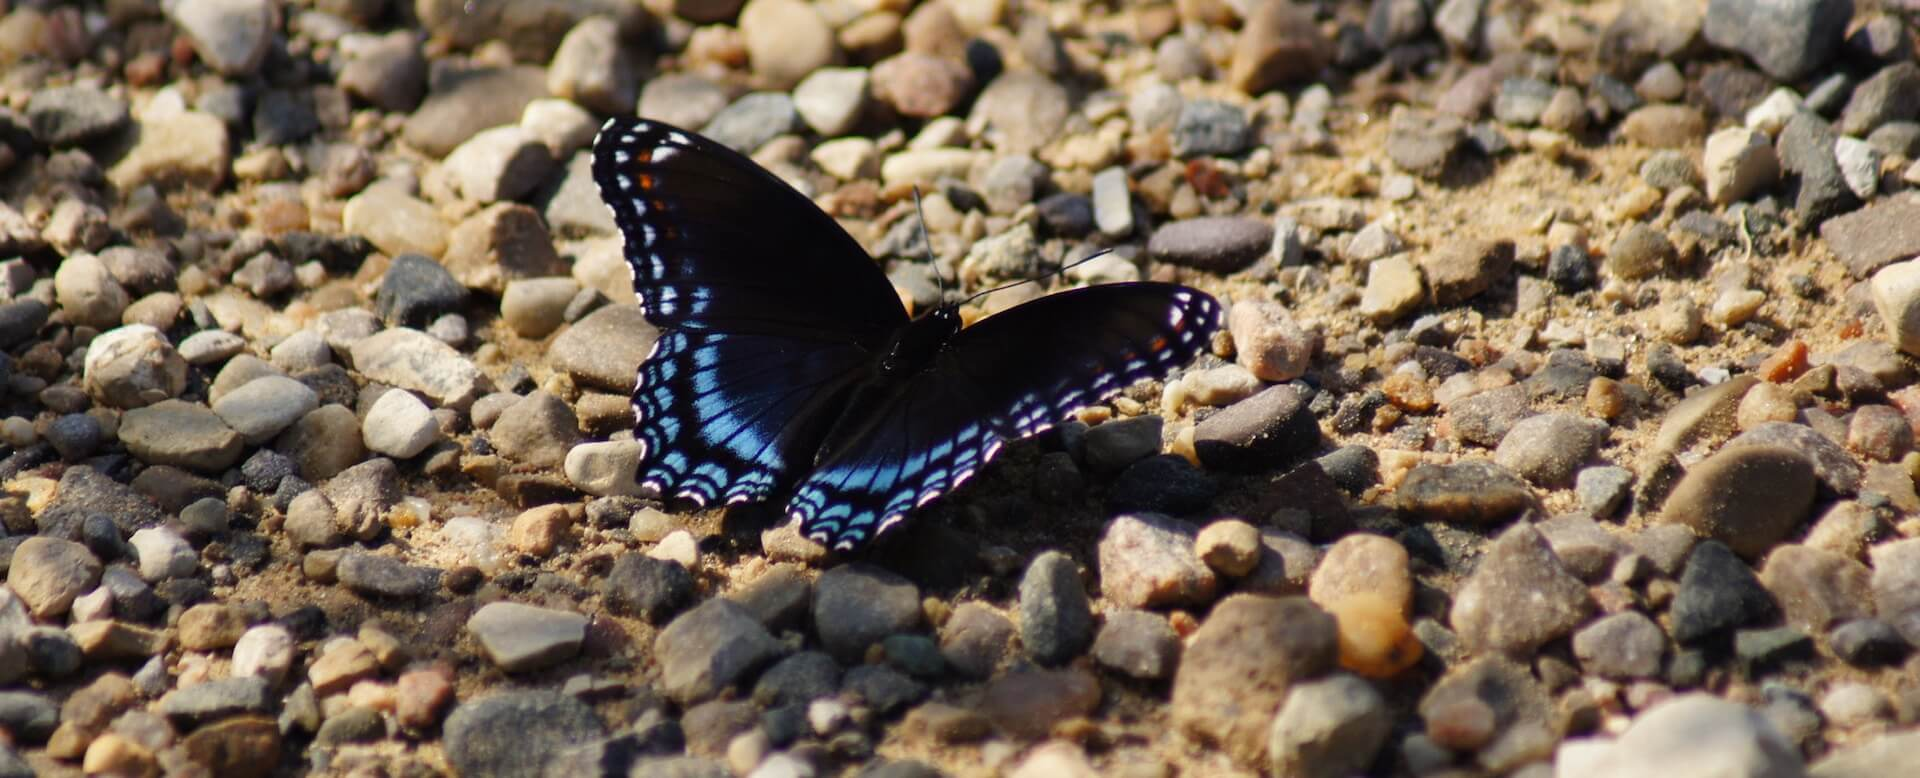 Butterfly Garden and Aquarium - Phuket